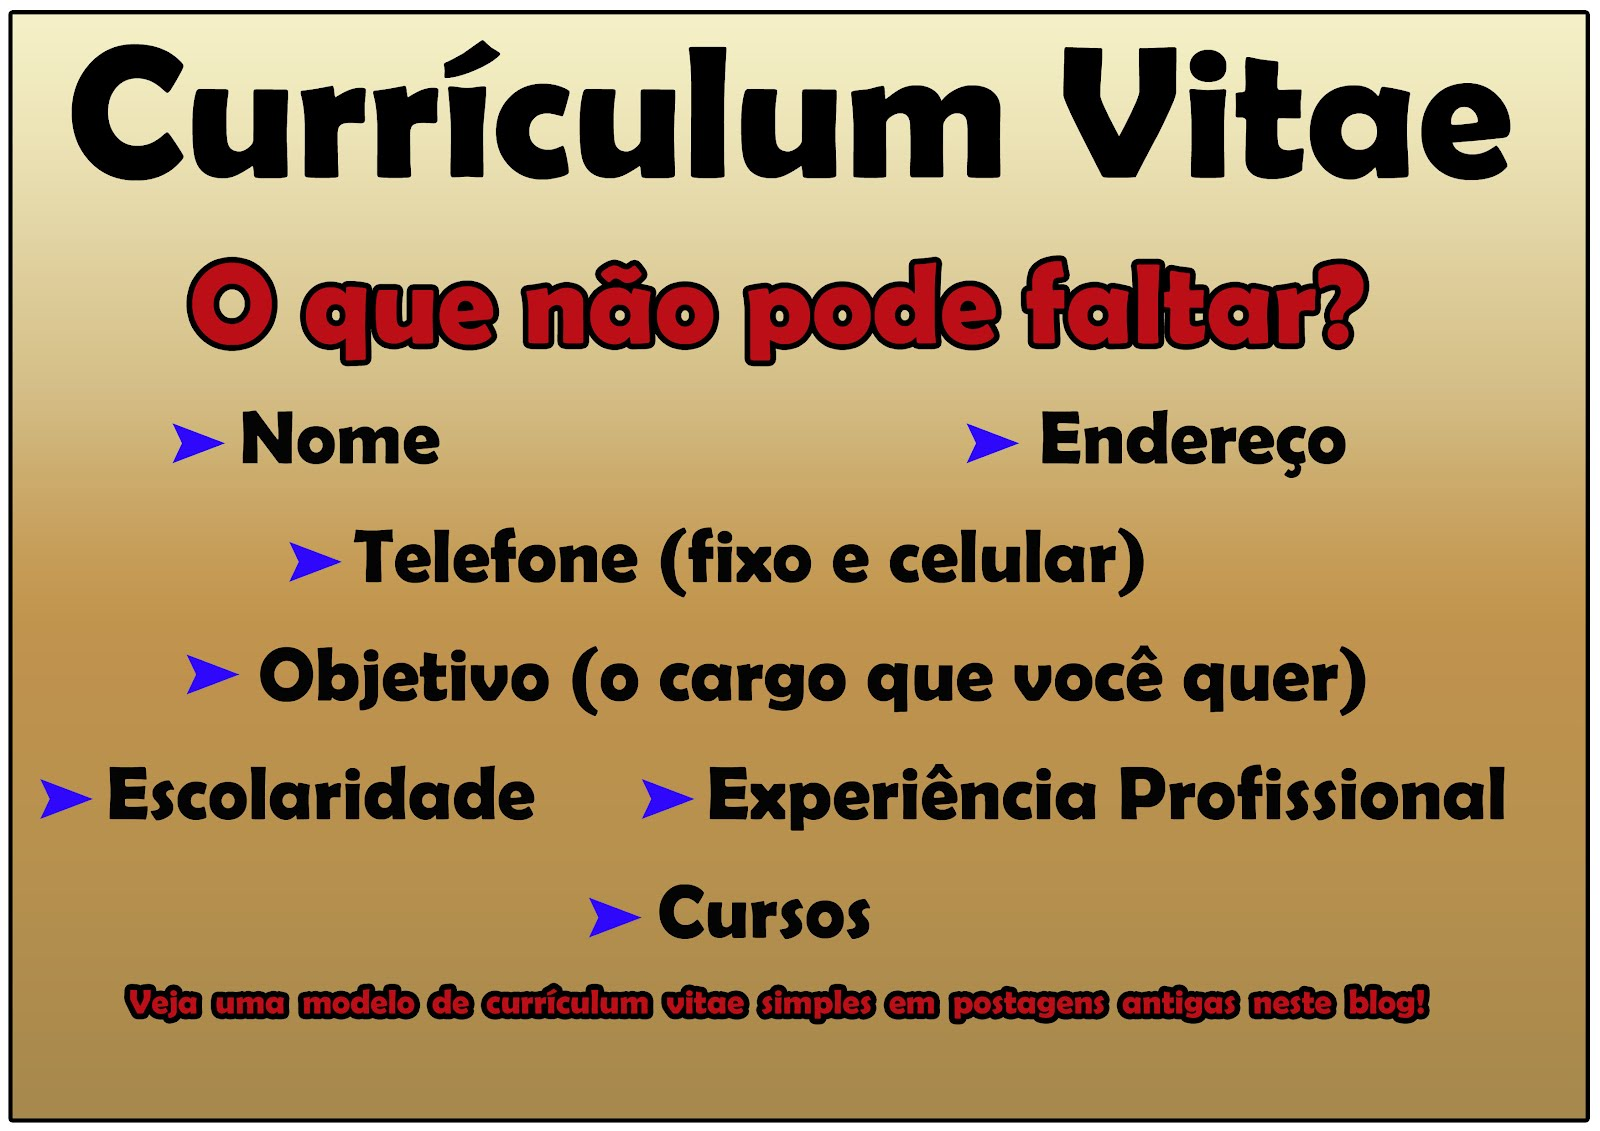 Asombroso Curriculum Vitae Para Custodio Motivo - Ejemplo De ...